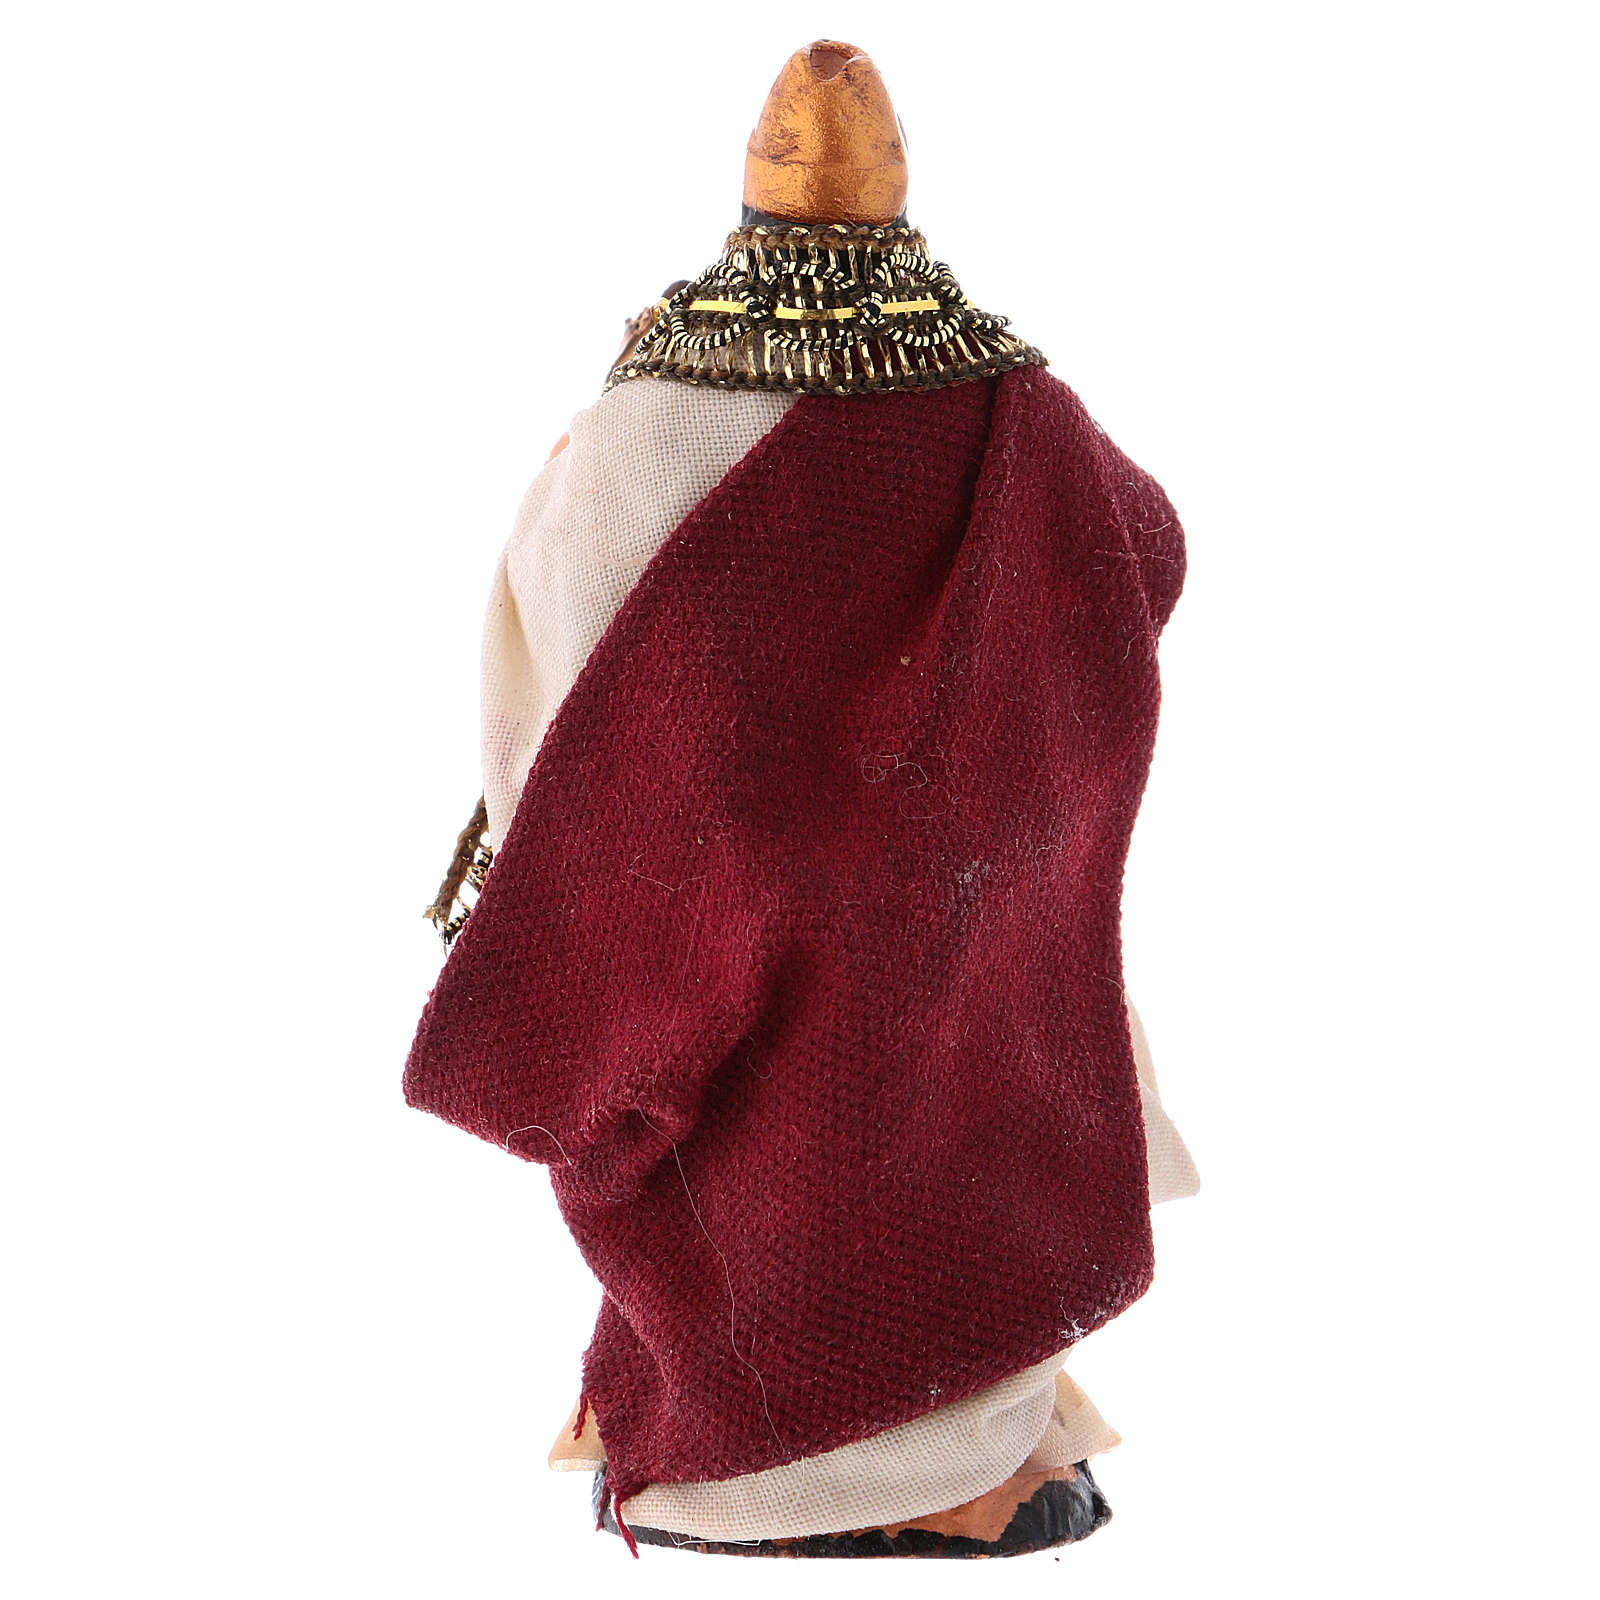 Neapolitan Nativity figurine, King Herod 8cm 4